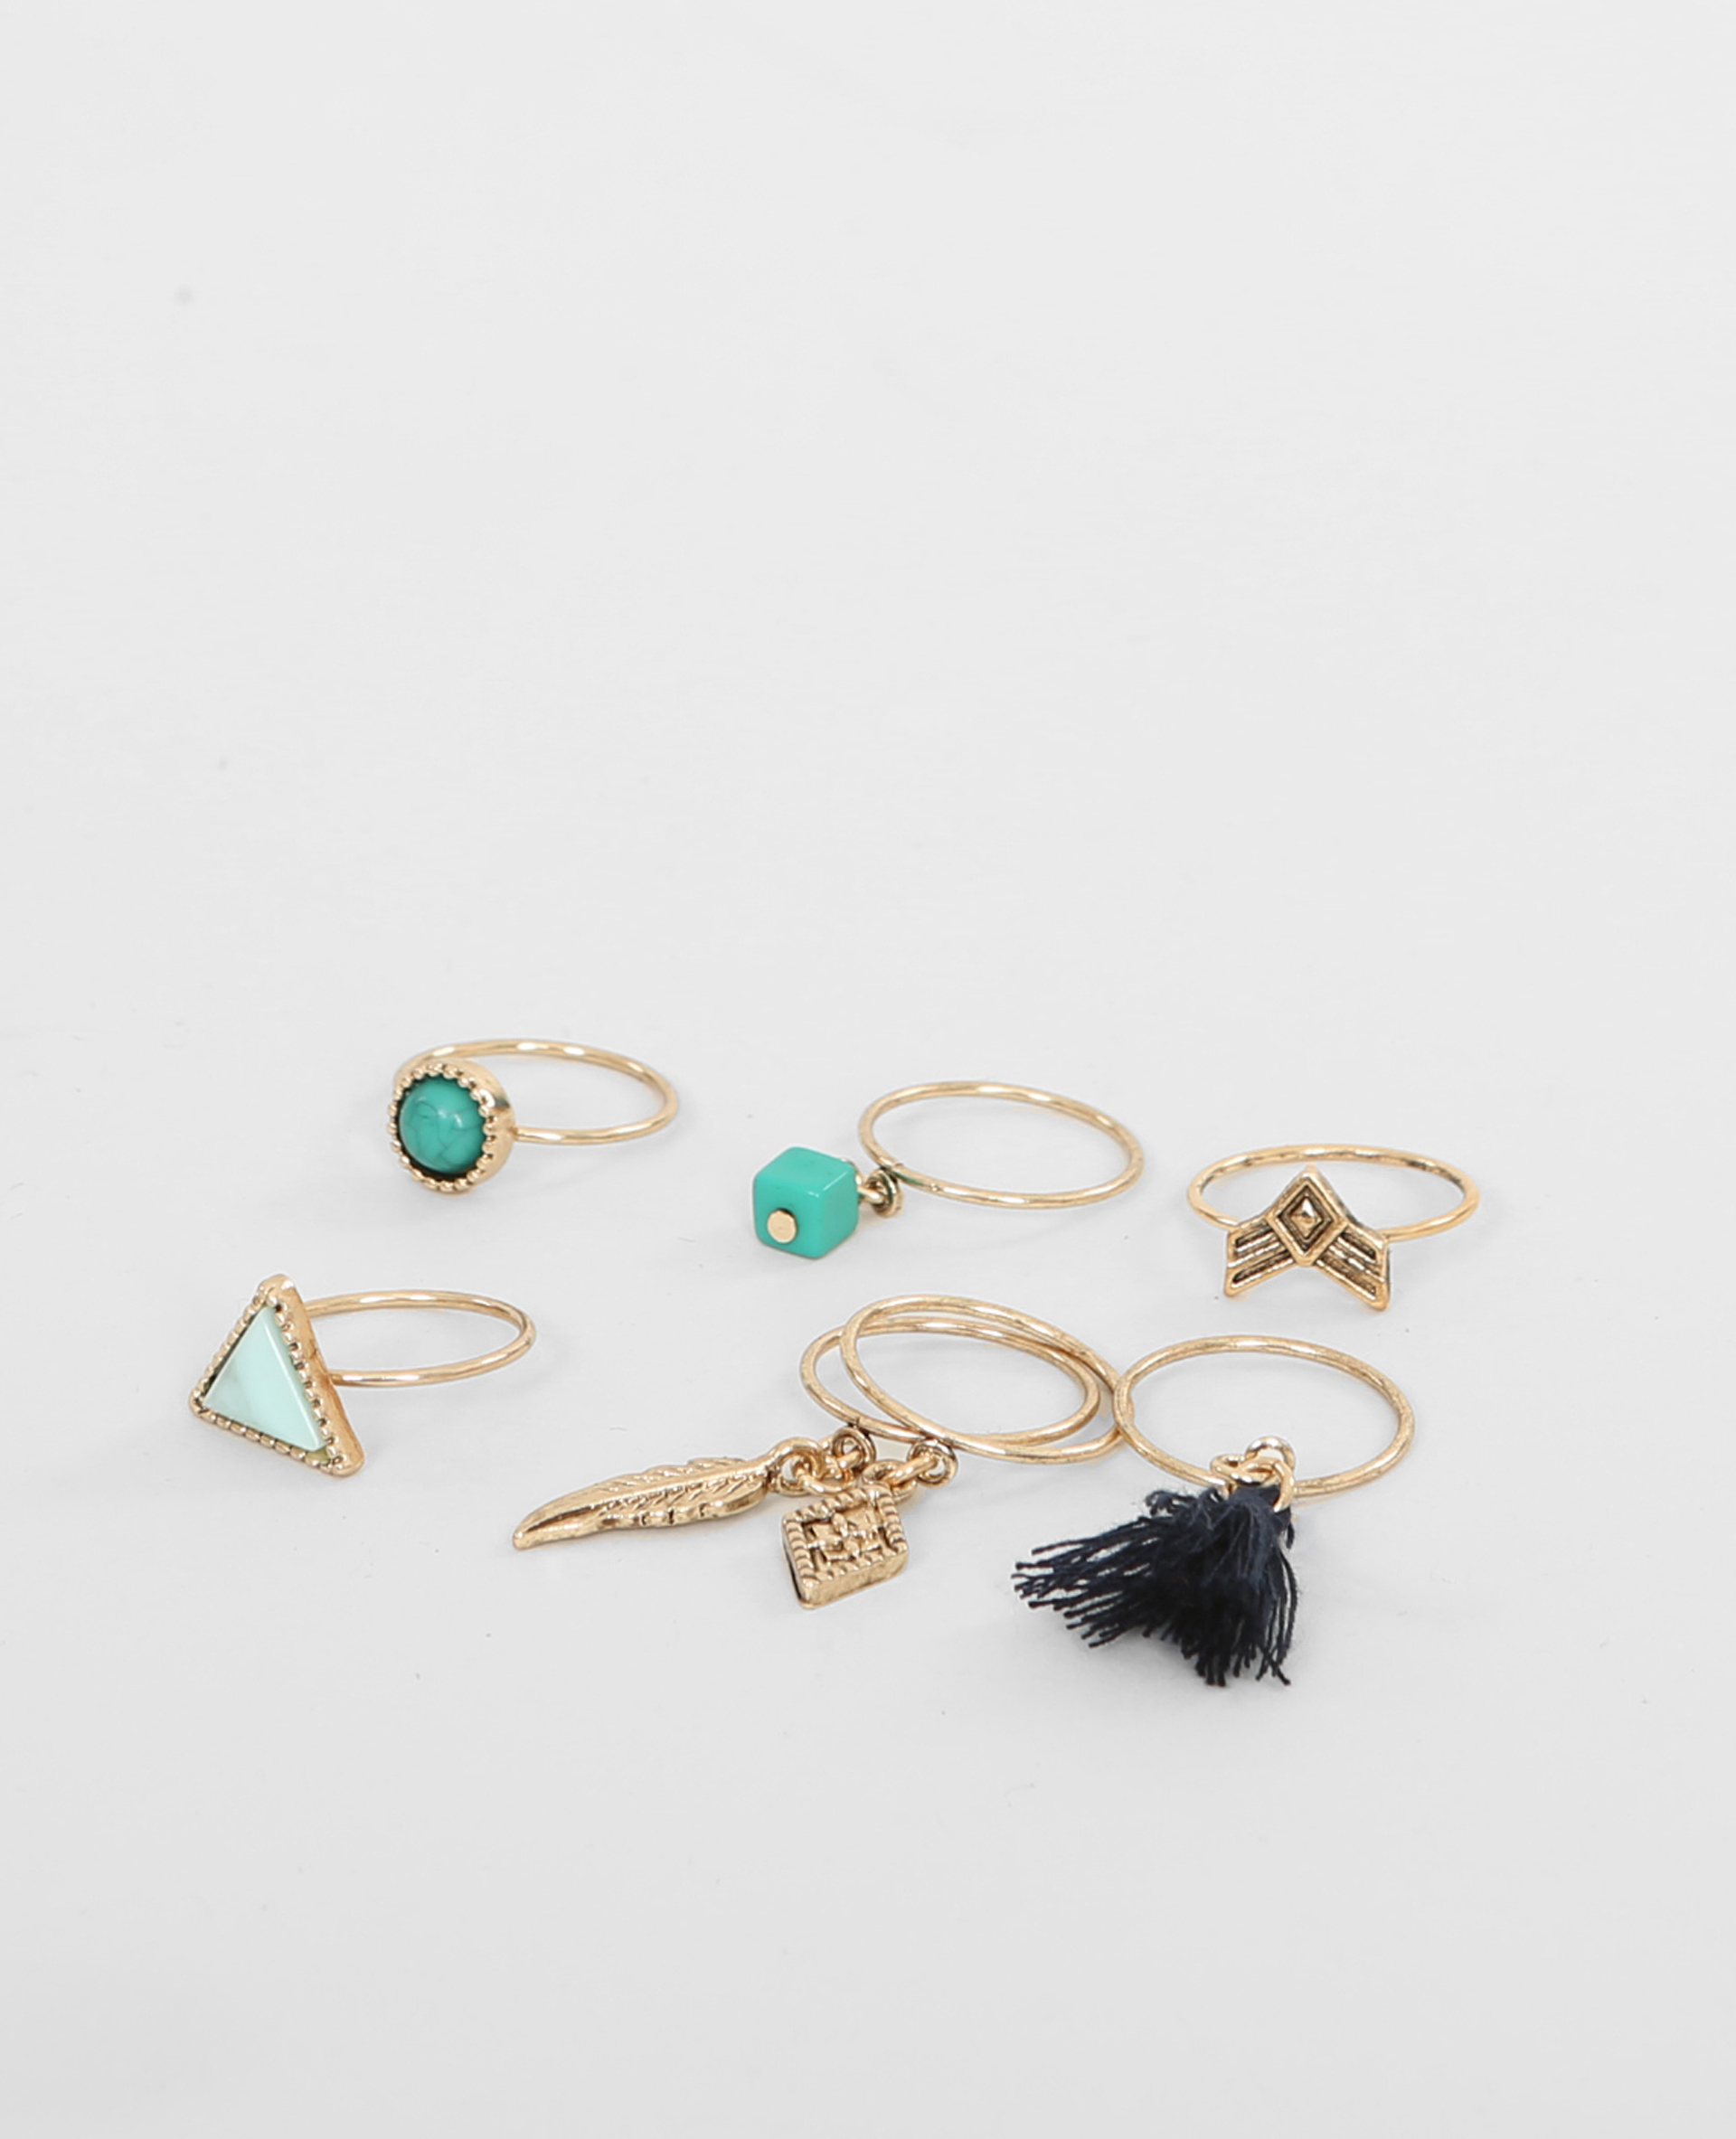 lot de bagues perles et pendentifs dor 966168g06f46. Black Bedroom Furniture Sets. Home Design Ideas